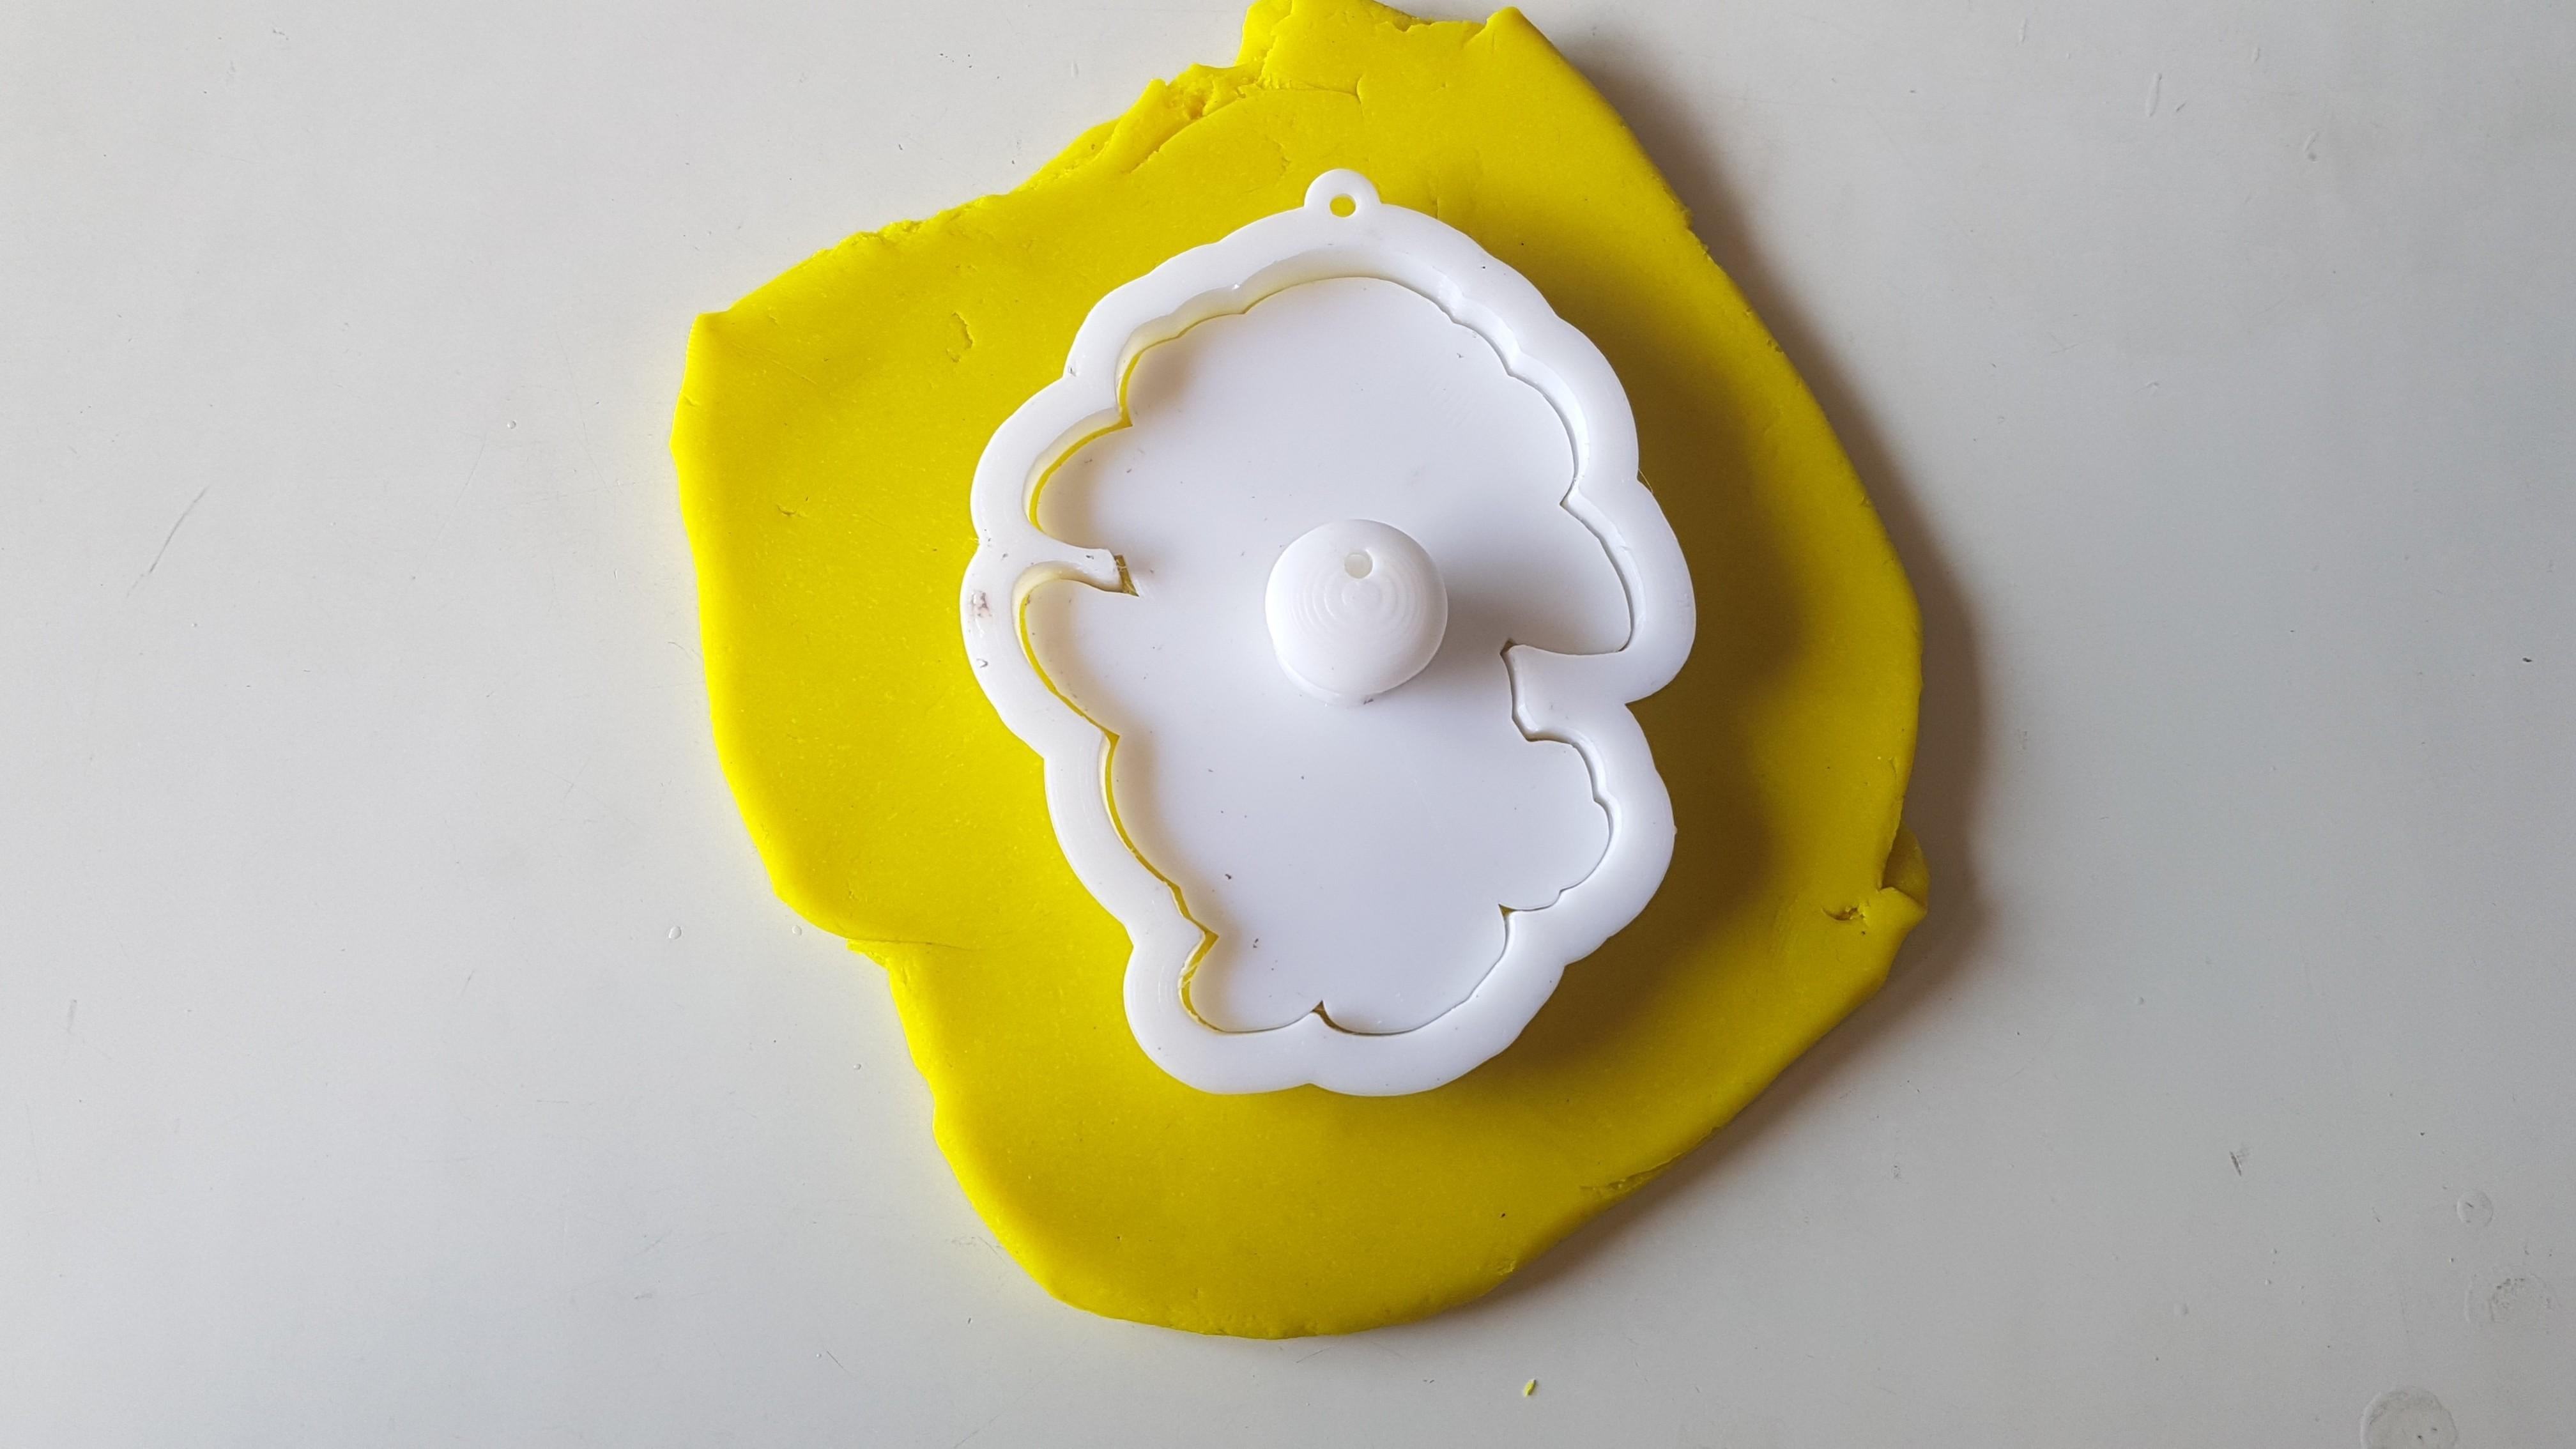 20180829_141307.jpg Download STL file Baby sheep cookie cutter • 3D printable design, 3dfactory